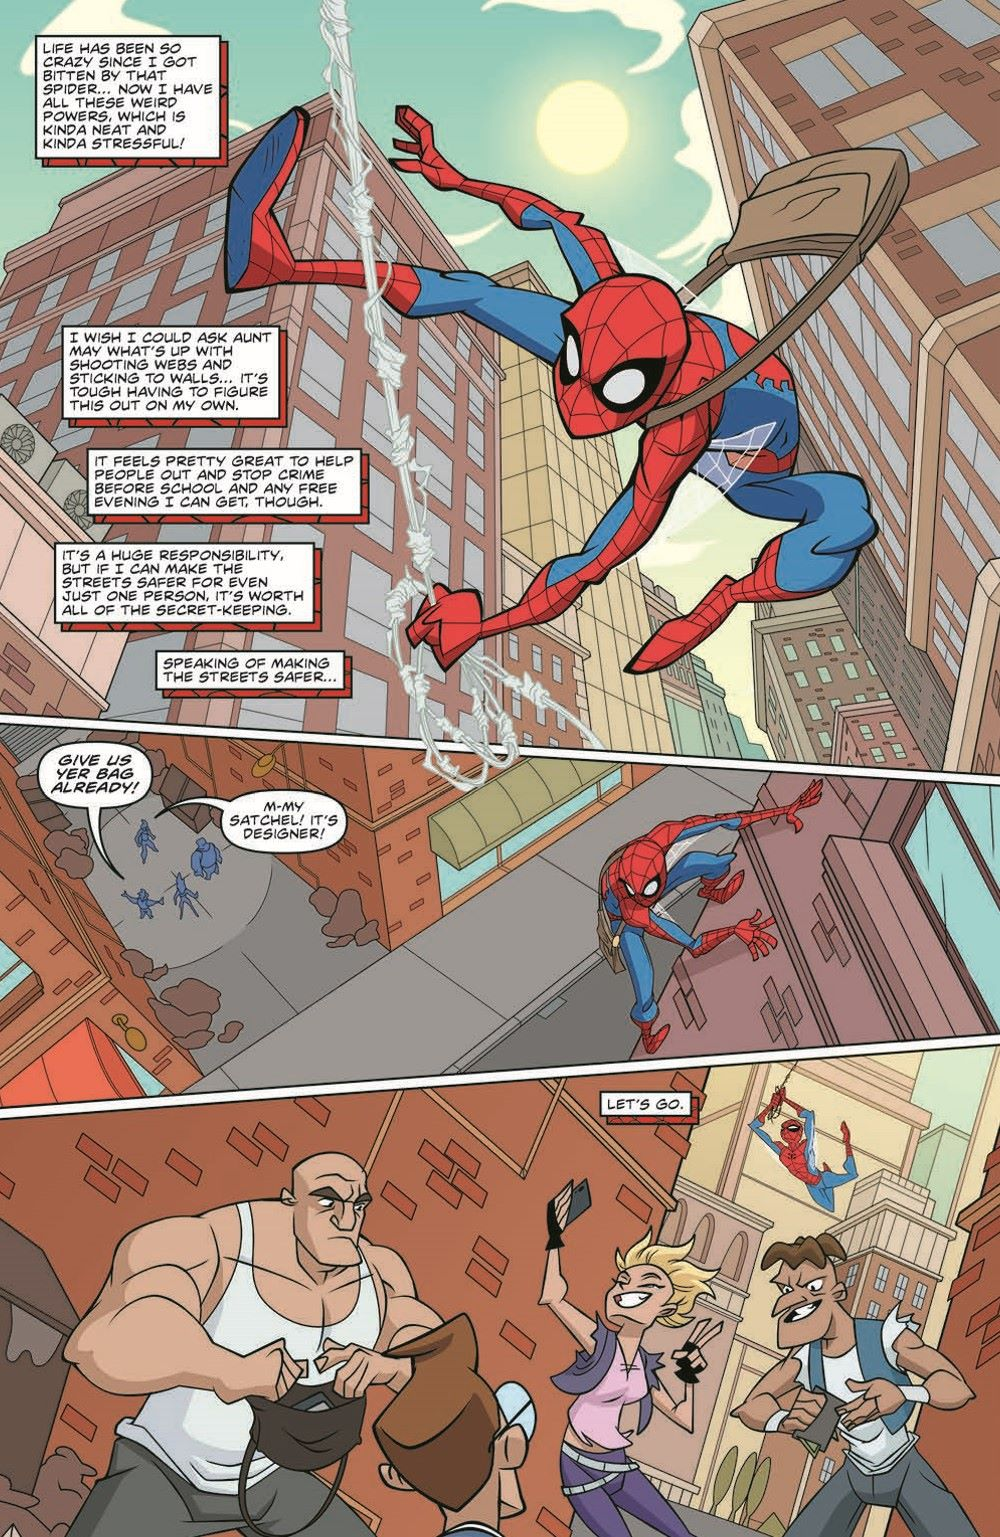 SpidermanV3-01_pr-4 ComicList Previews: MARVEL ACTION SPIDER-MAN VOLUME 3 #1